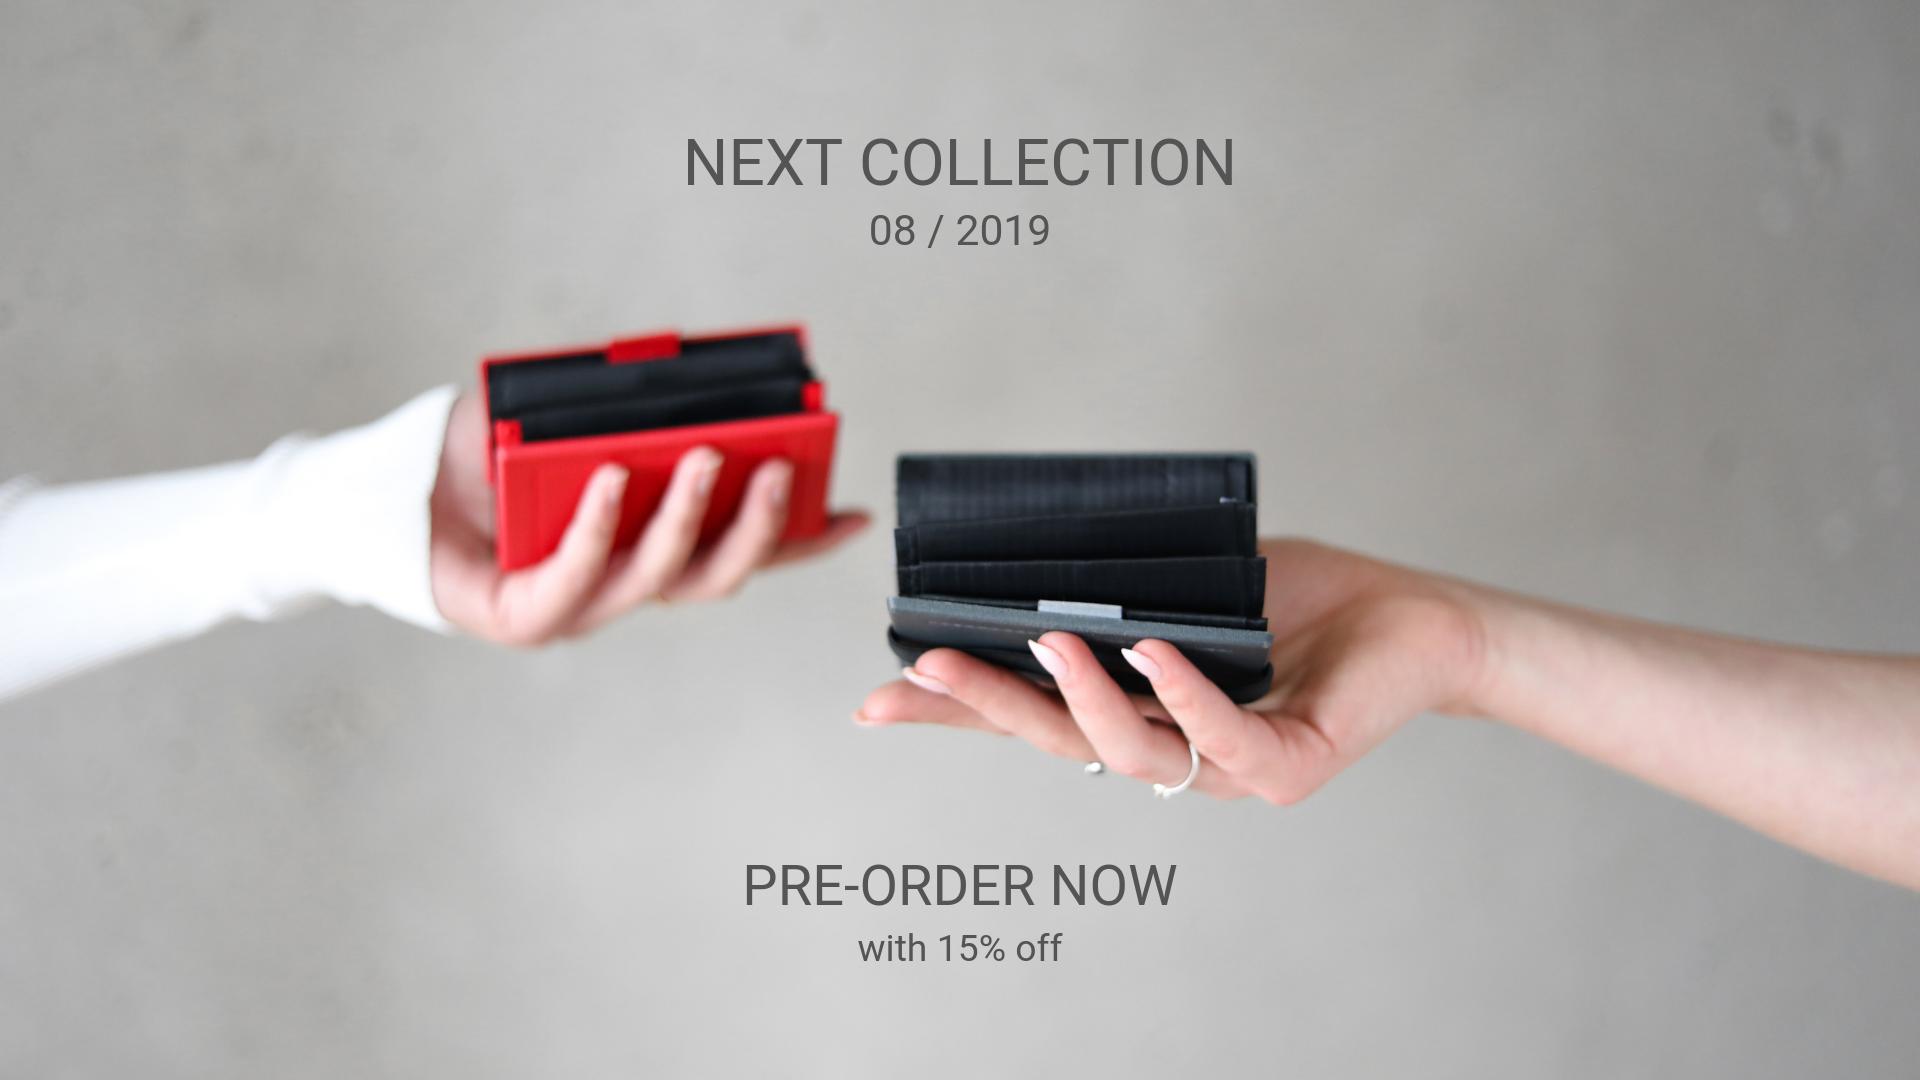 smartbag-preorder-15-off.png